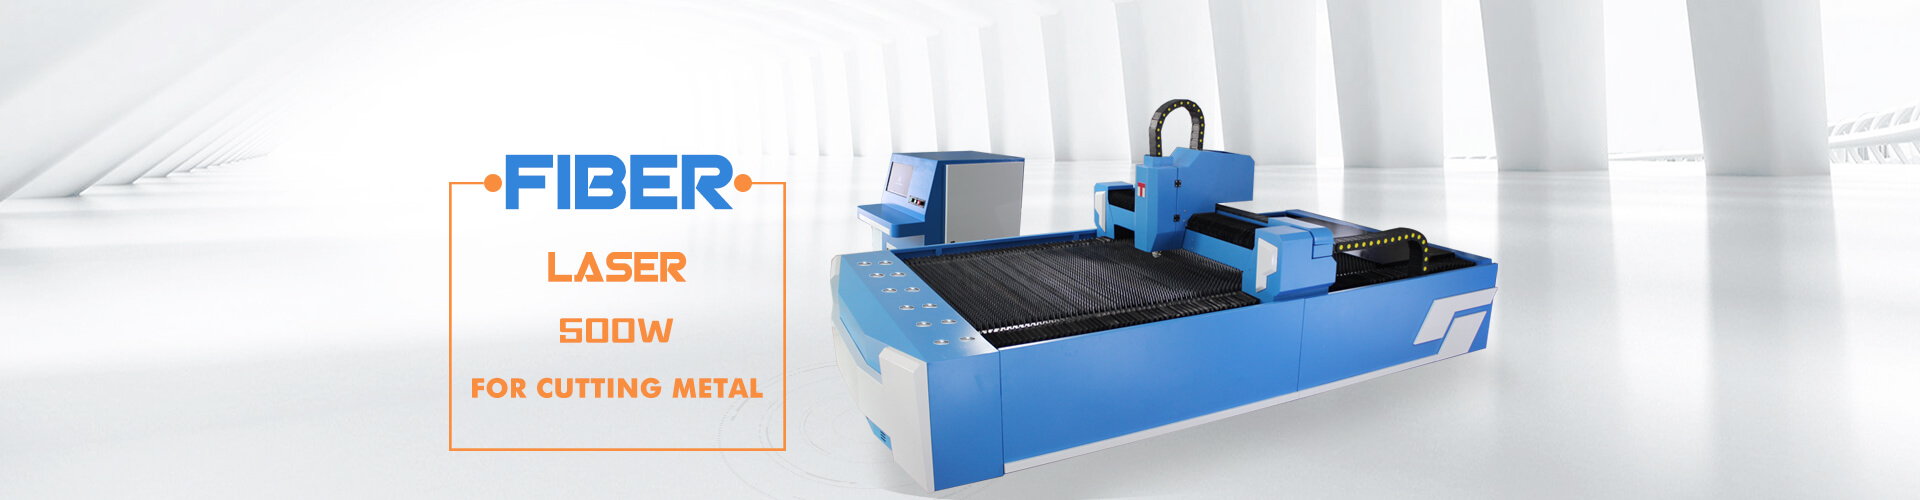 500W fiber laser cutter